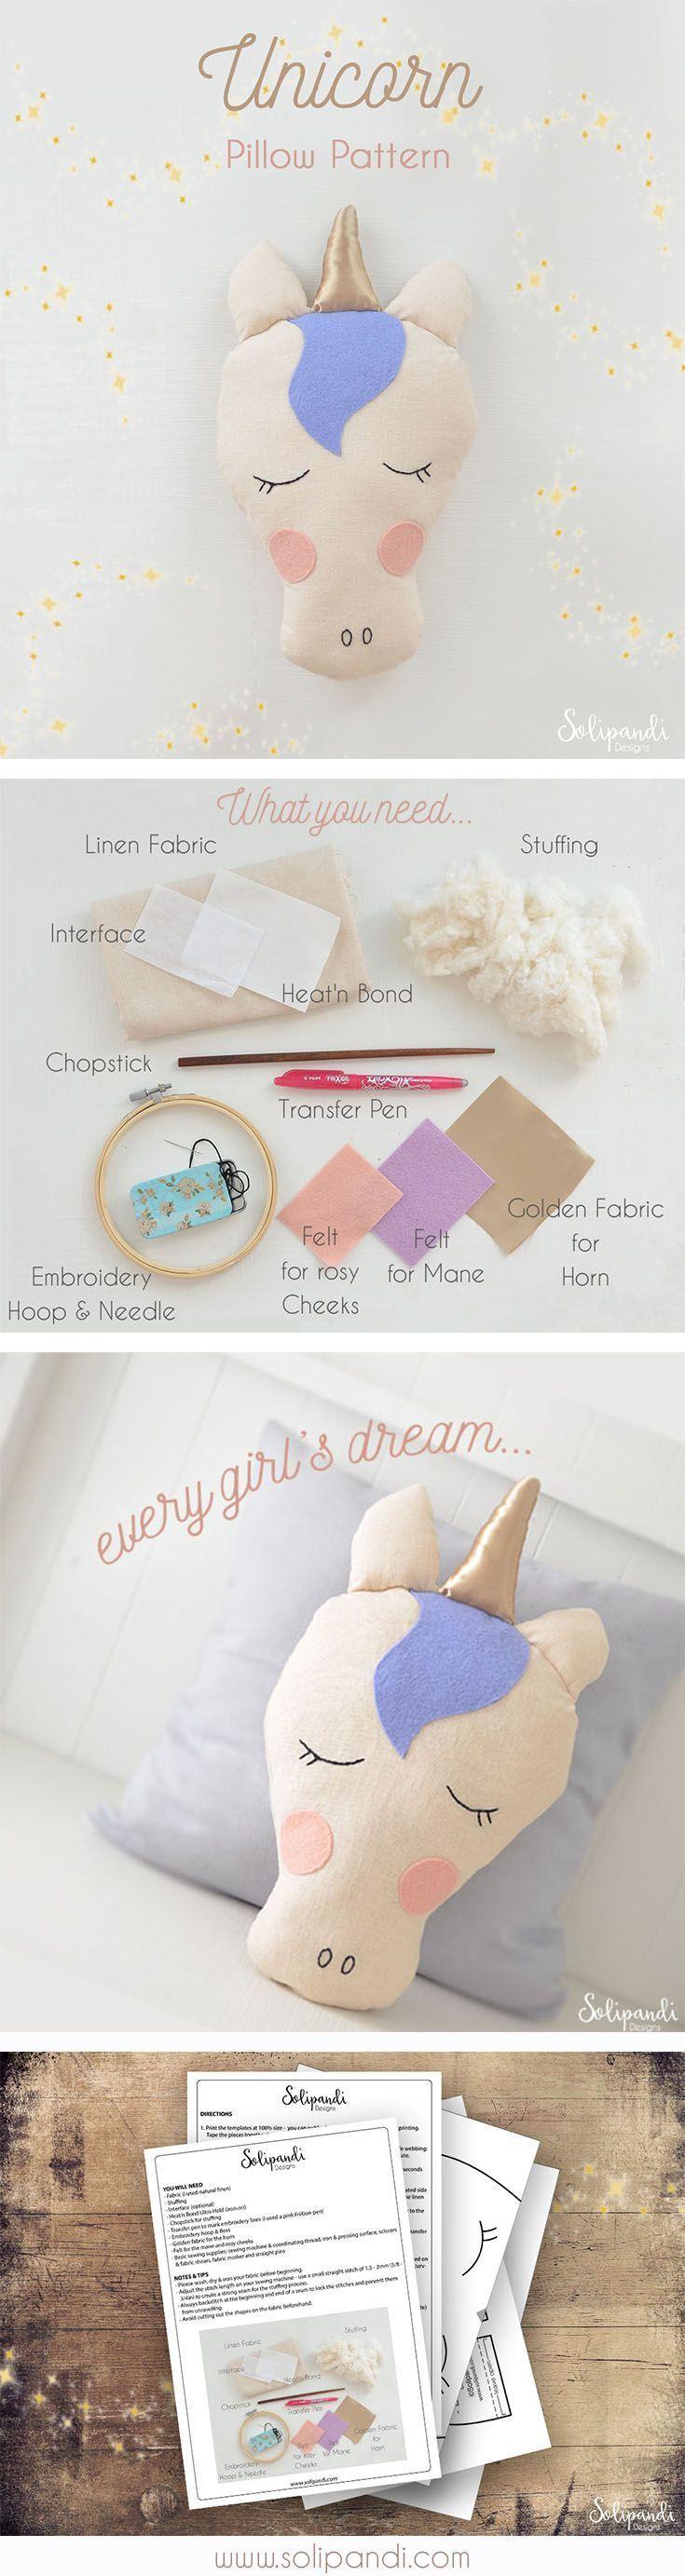 unicorn pillow sewing pattern diy